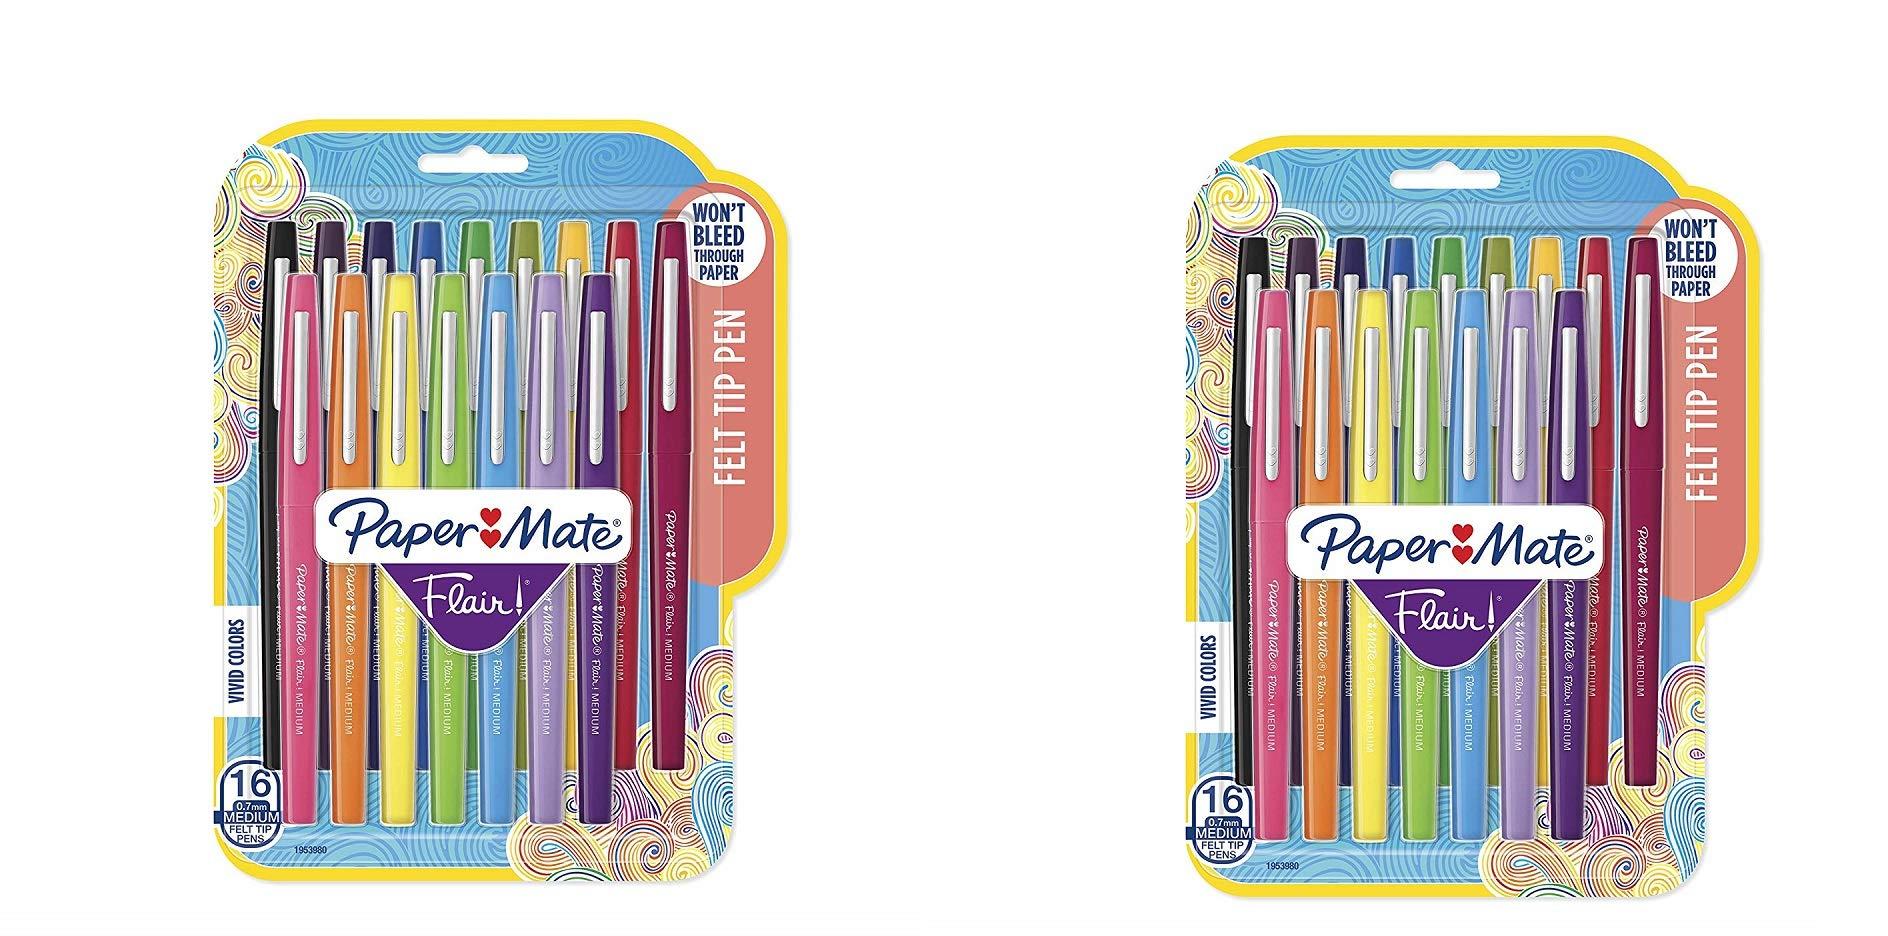 Flair Felt Tip Pens, Medium Point (0.7mm), Assorted Colors, 16 Count